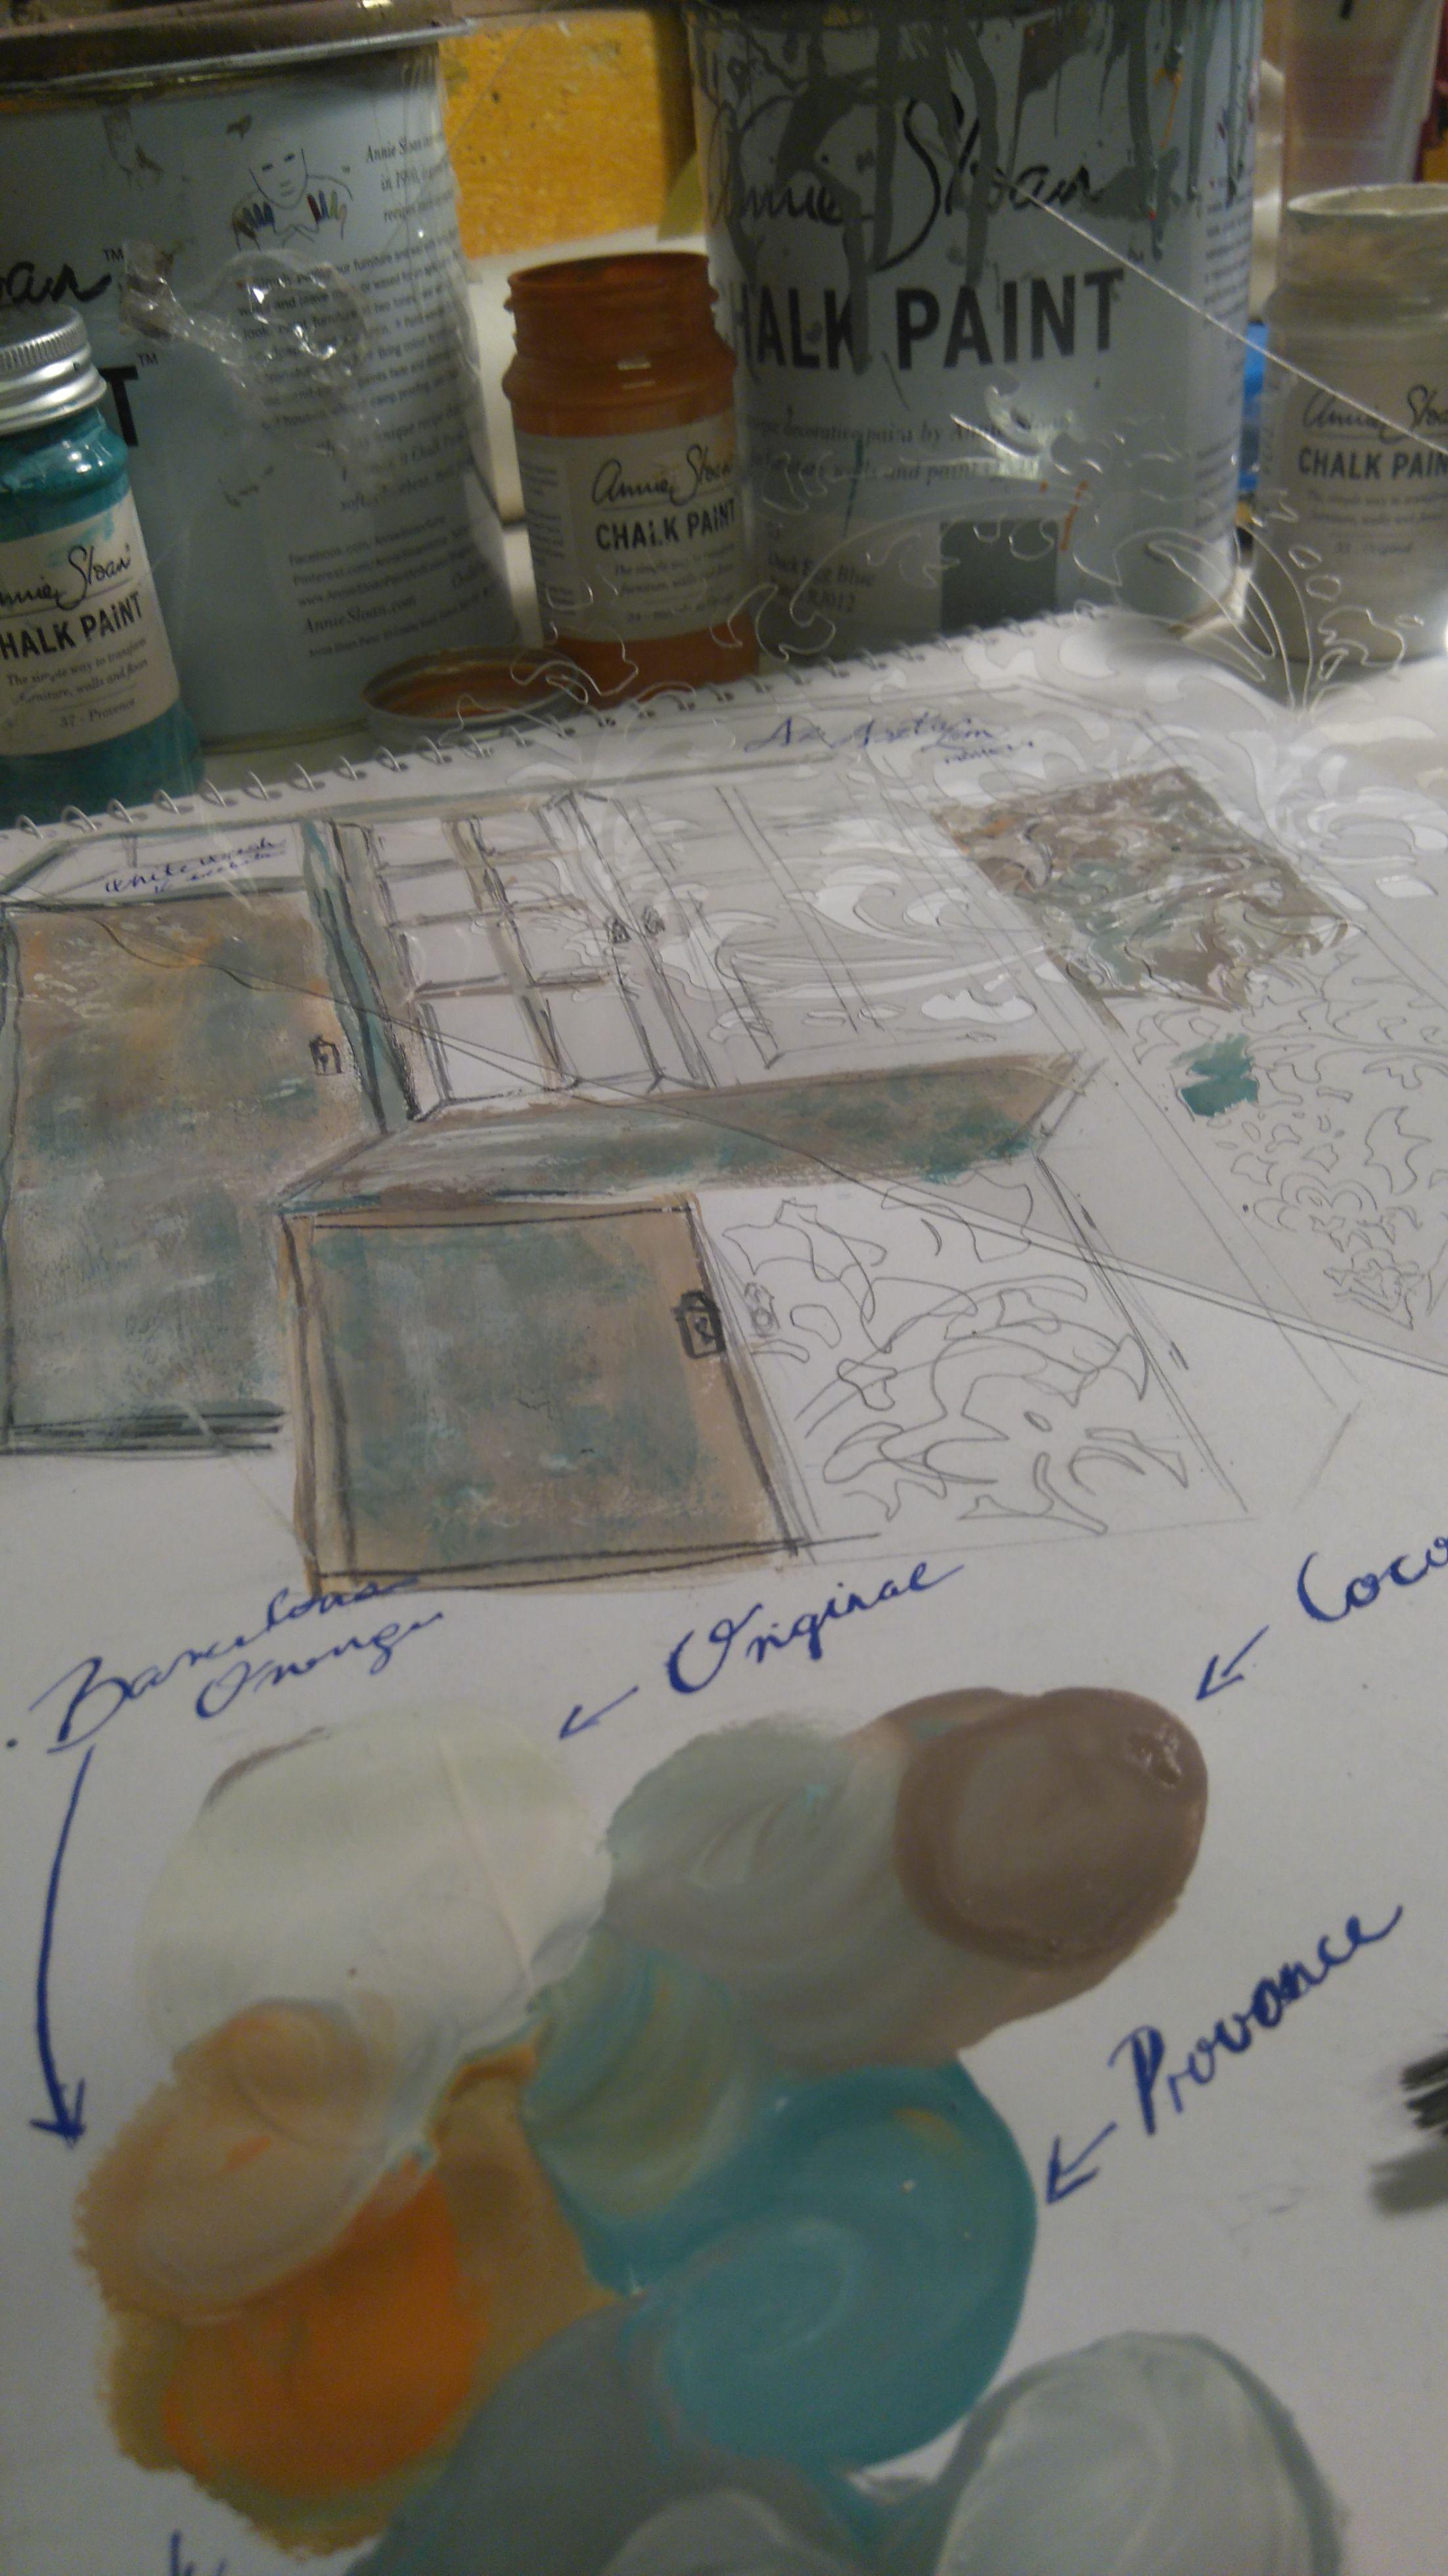 Annie Sloan Chalk Paint, Provence, Coco, Barcelona Orange, Original, Stencil,